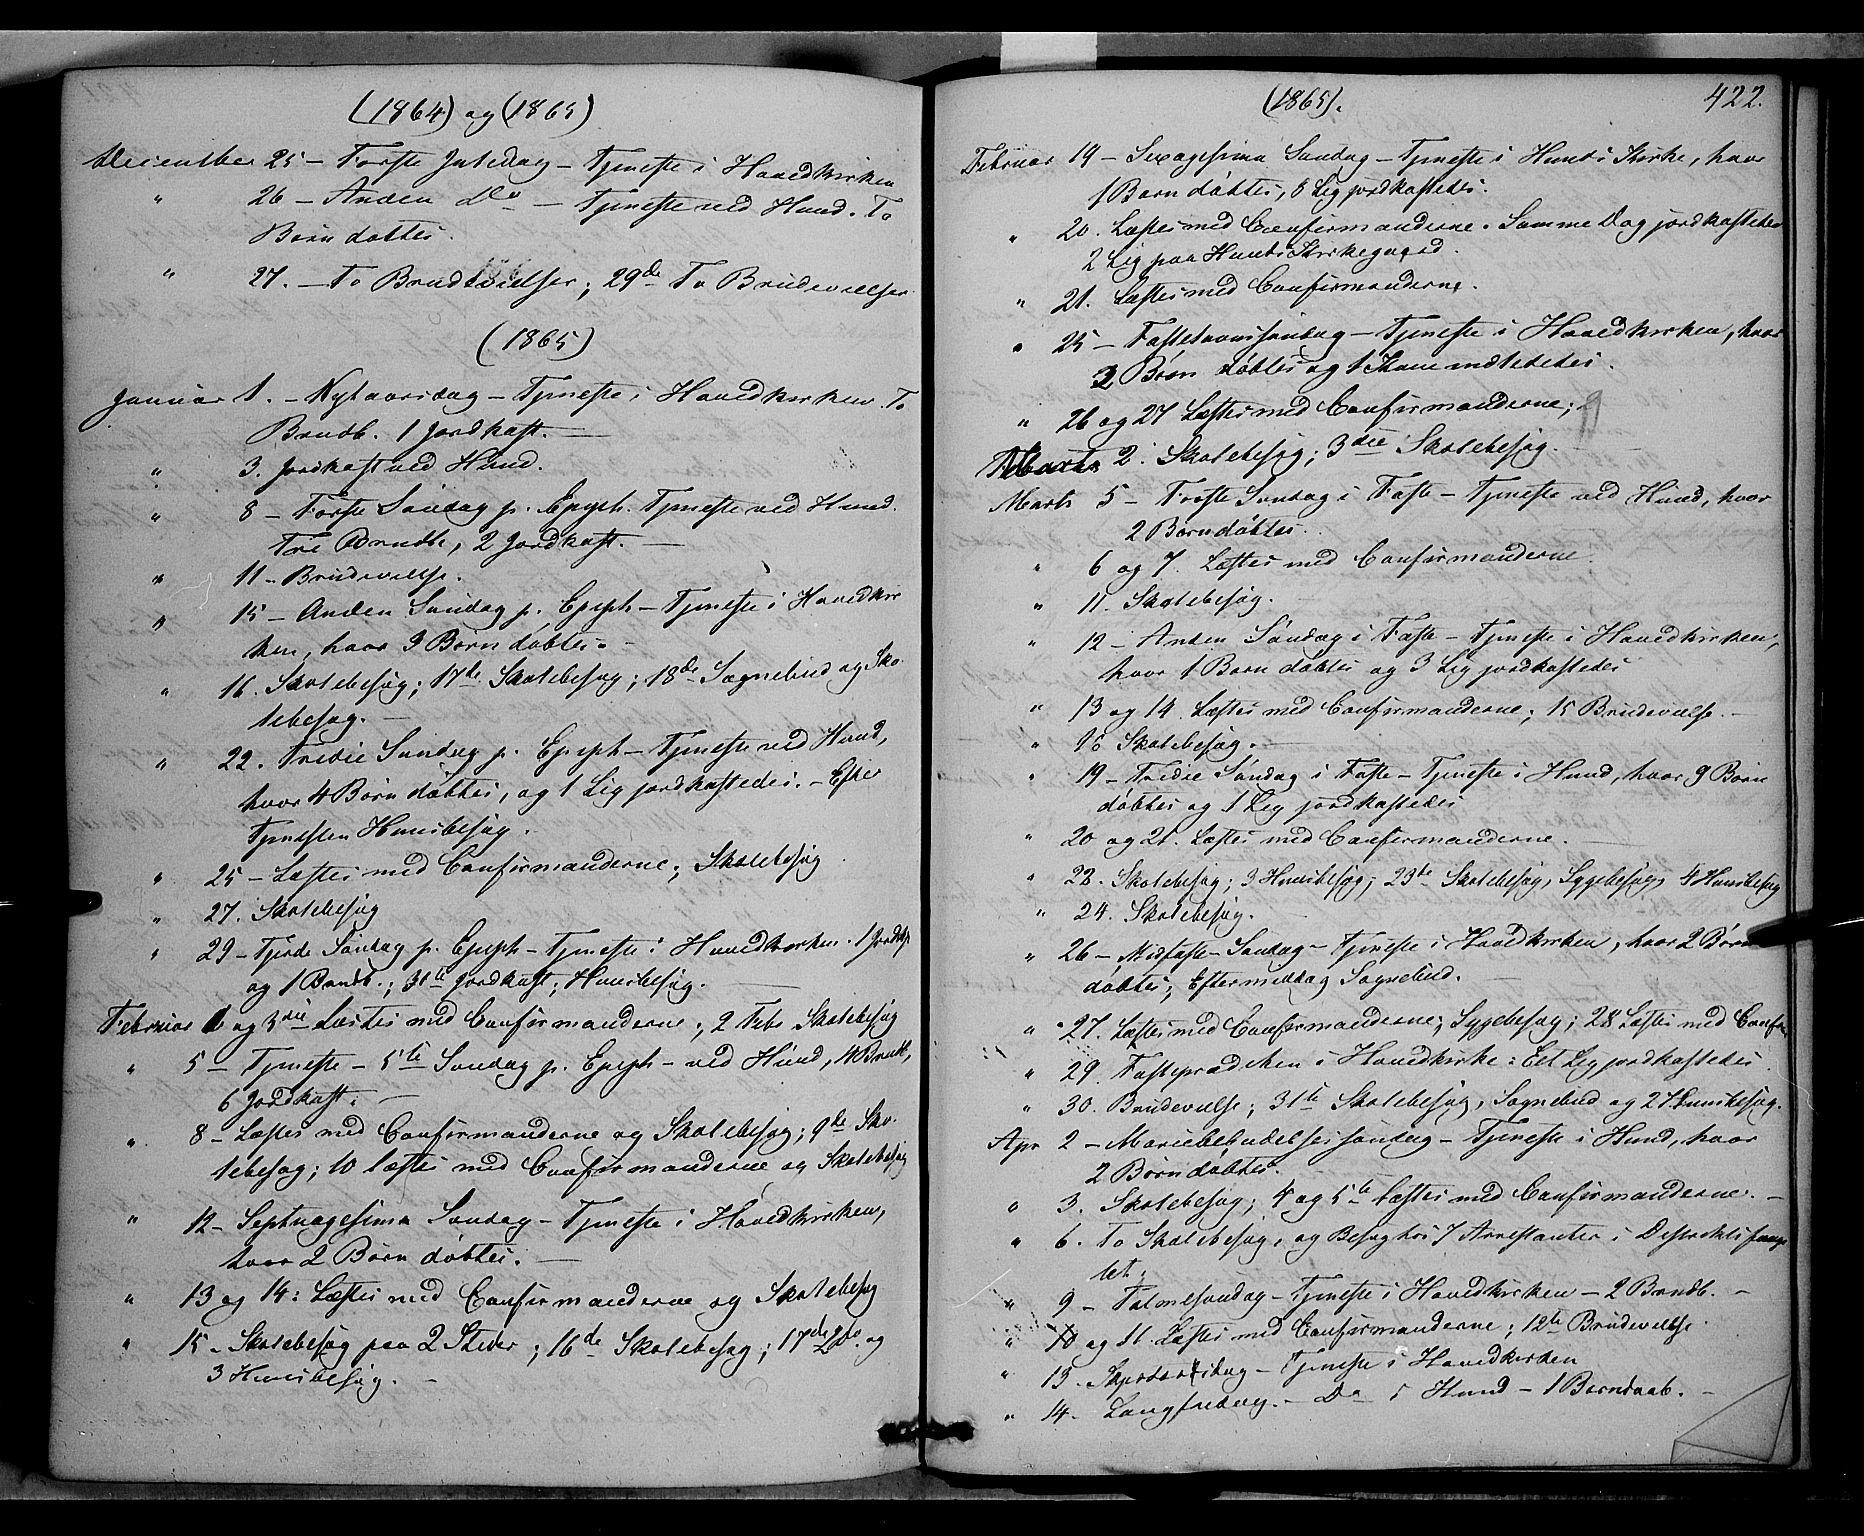 SAH, Vardal prestekontor, H/Ha/Haa/L0006: Ministerialbok nr. 6, 1854-1866, s. 422